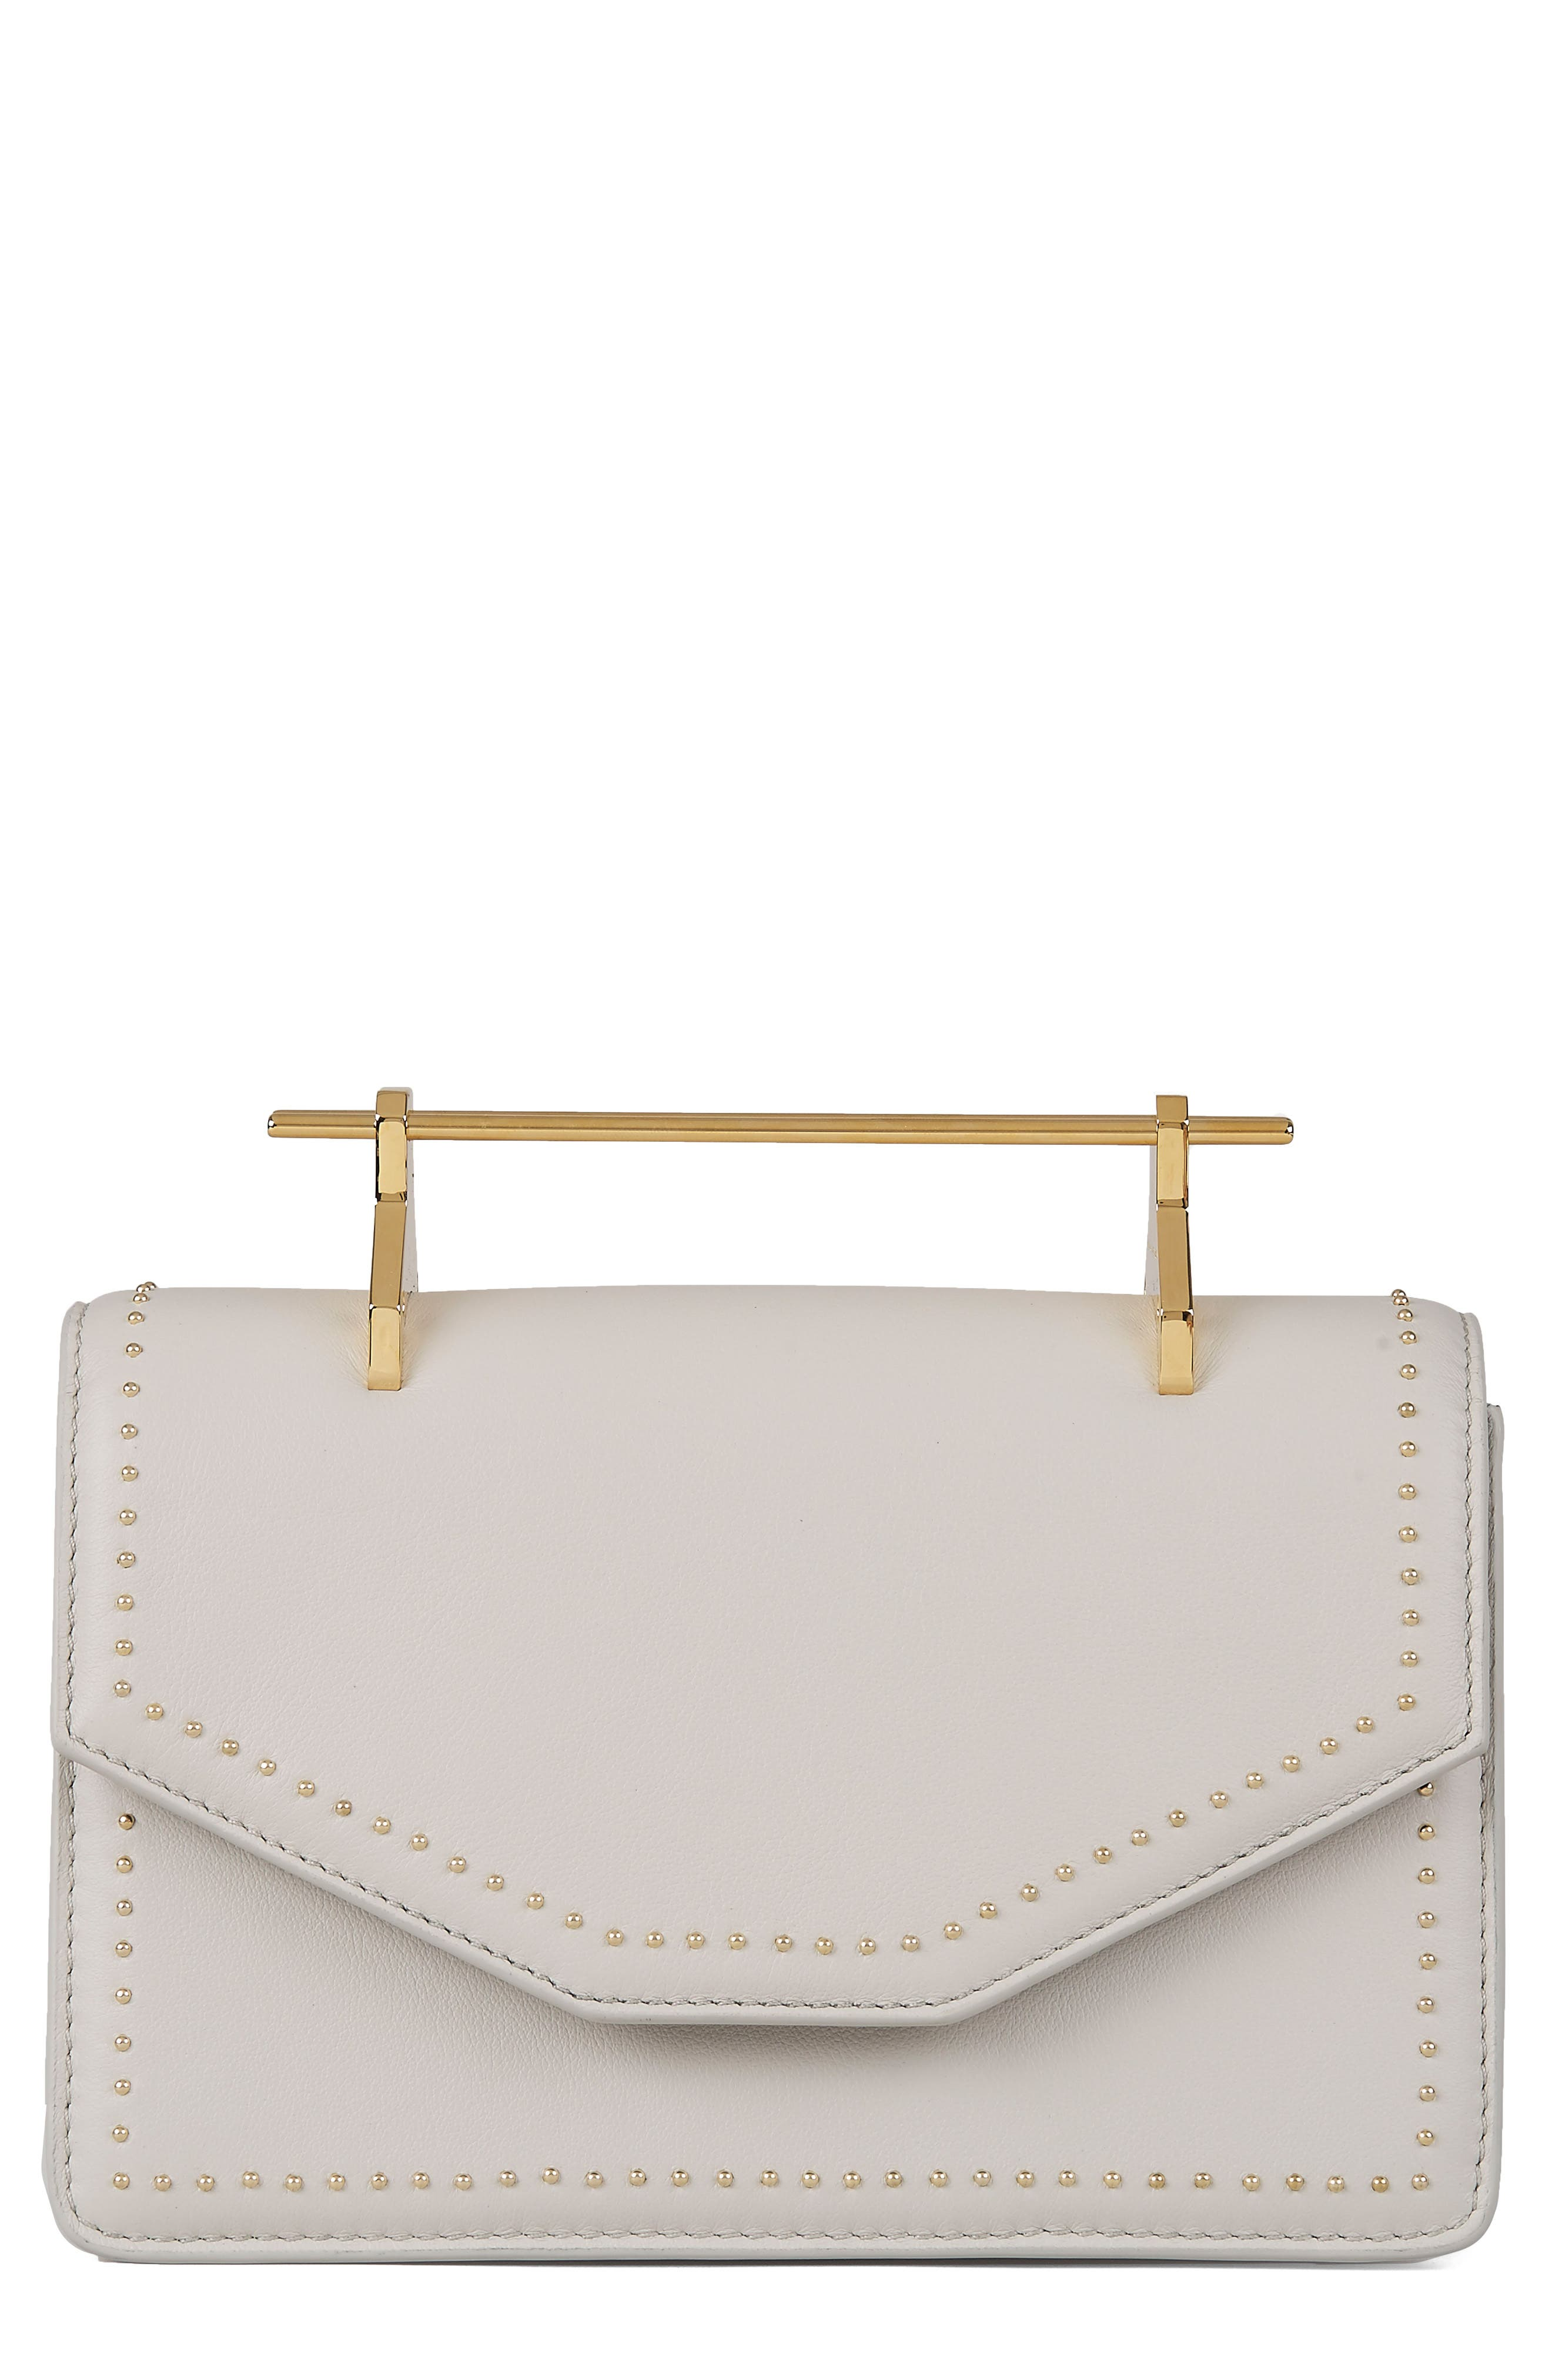 Indre Leather Shoulder Bag,                             Main thumbnail 1, color,                             Studded Cool Grey/ Gold